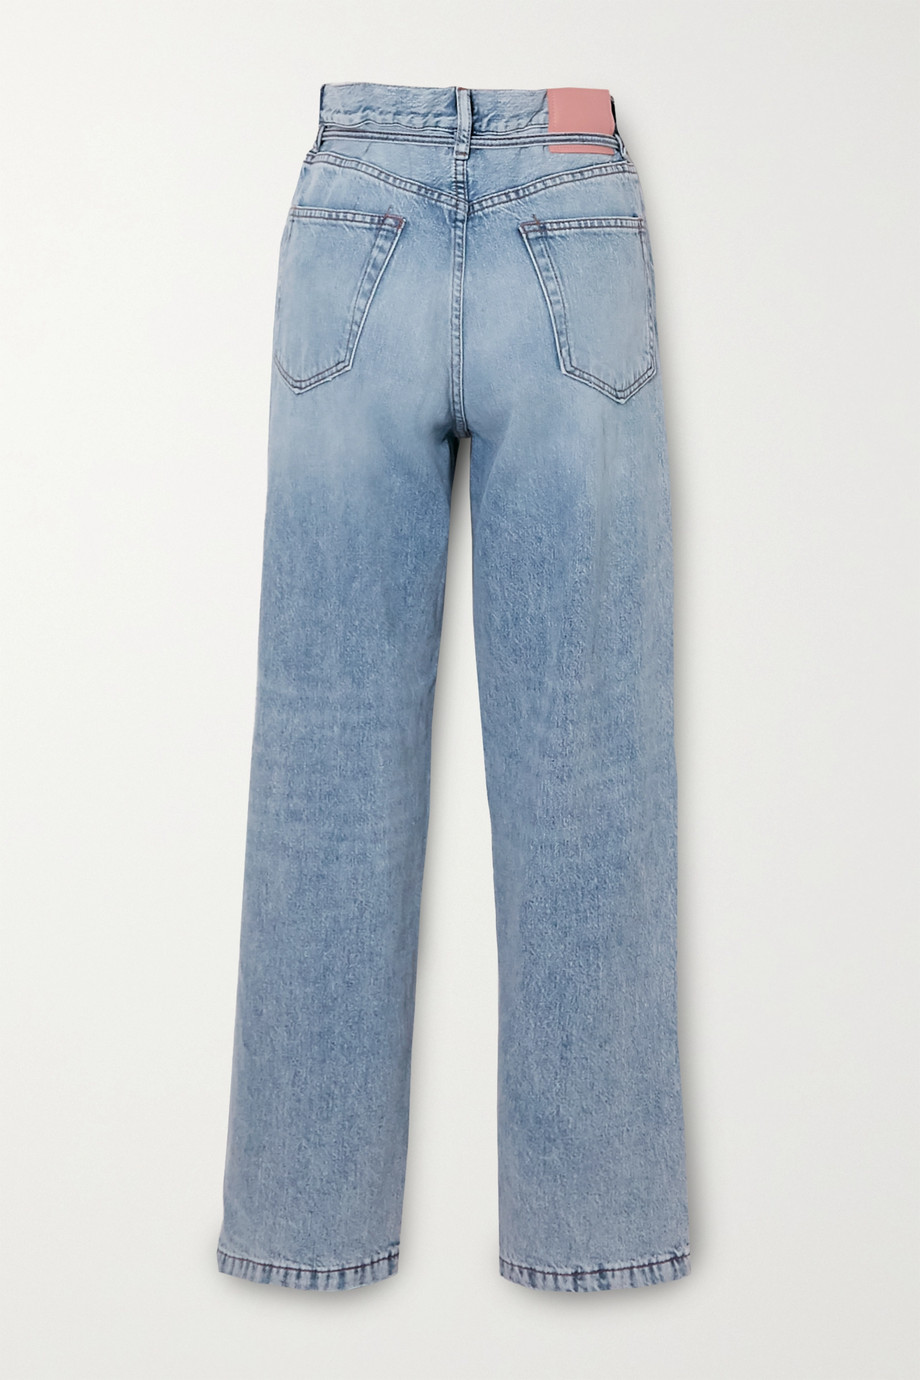 Acne Studios 有机高腰直筒牛仔裤